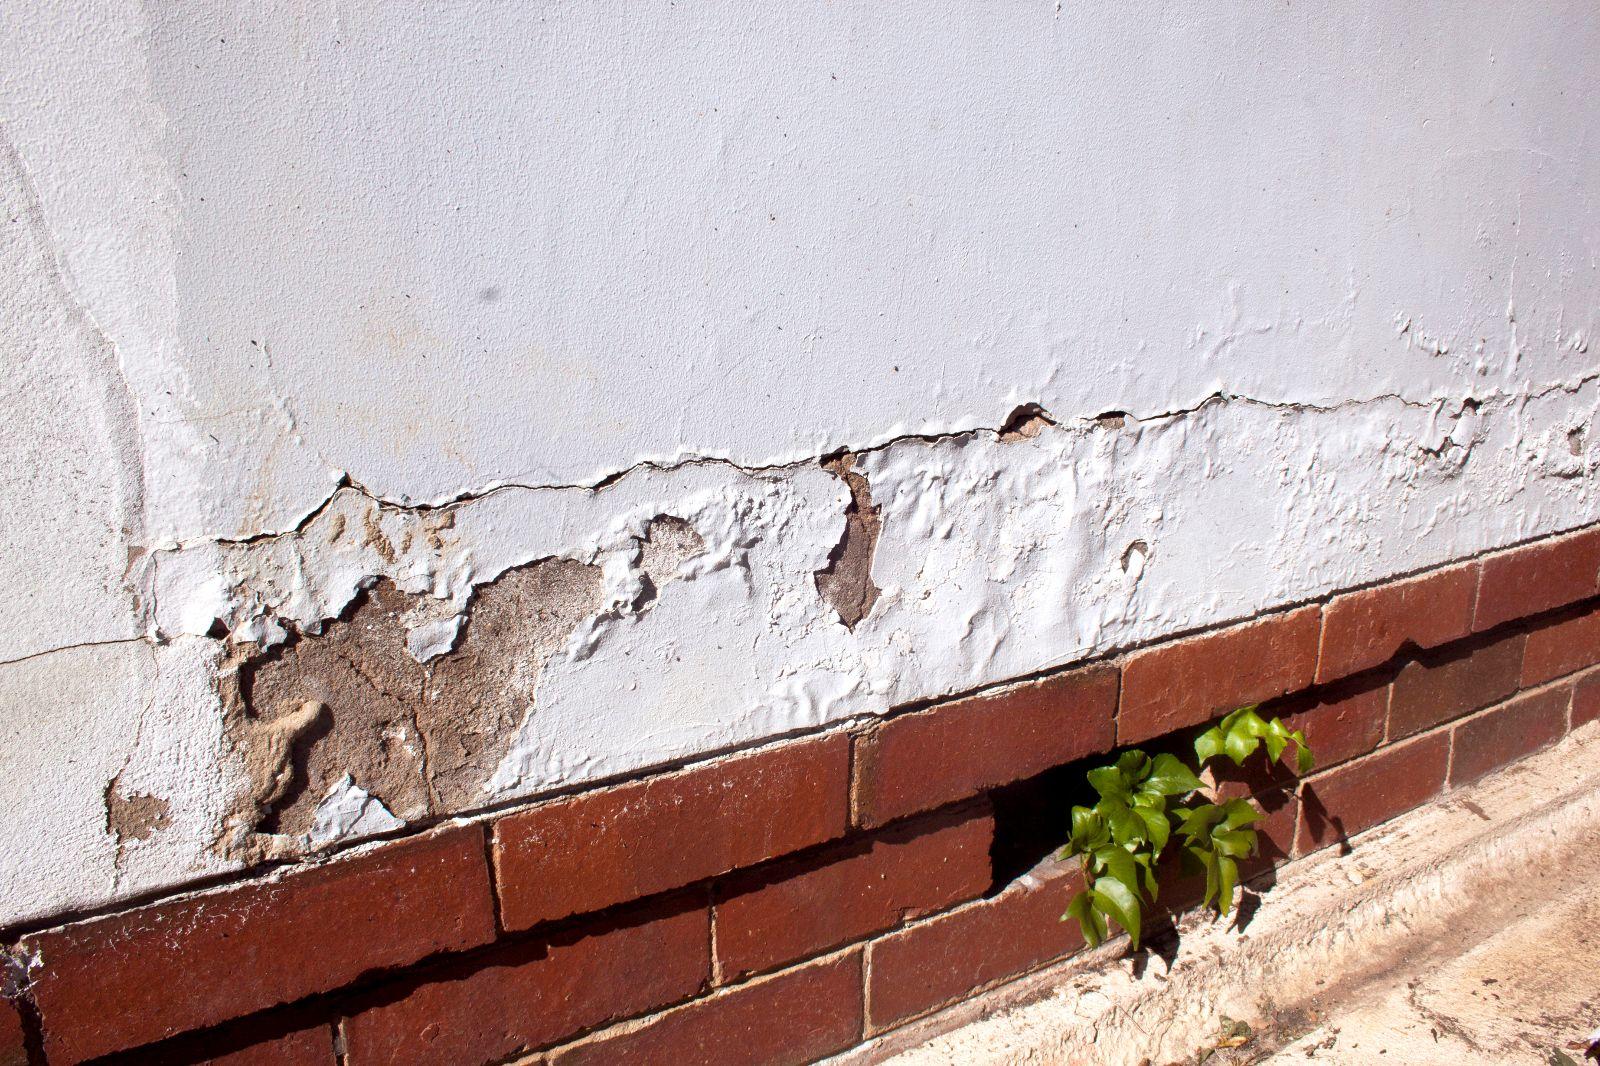 Mauertrockenlegung nach mechanischem Verfahren